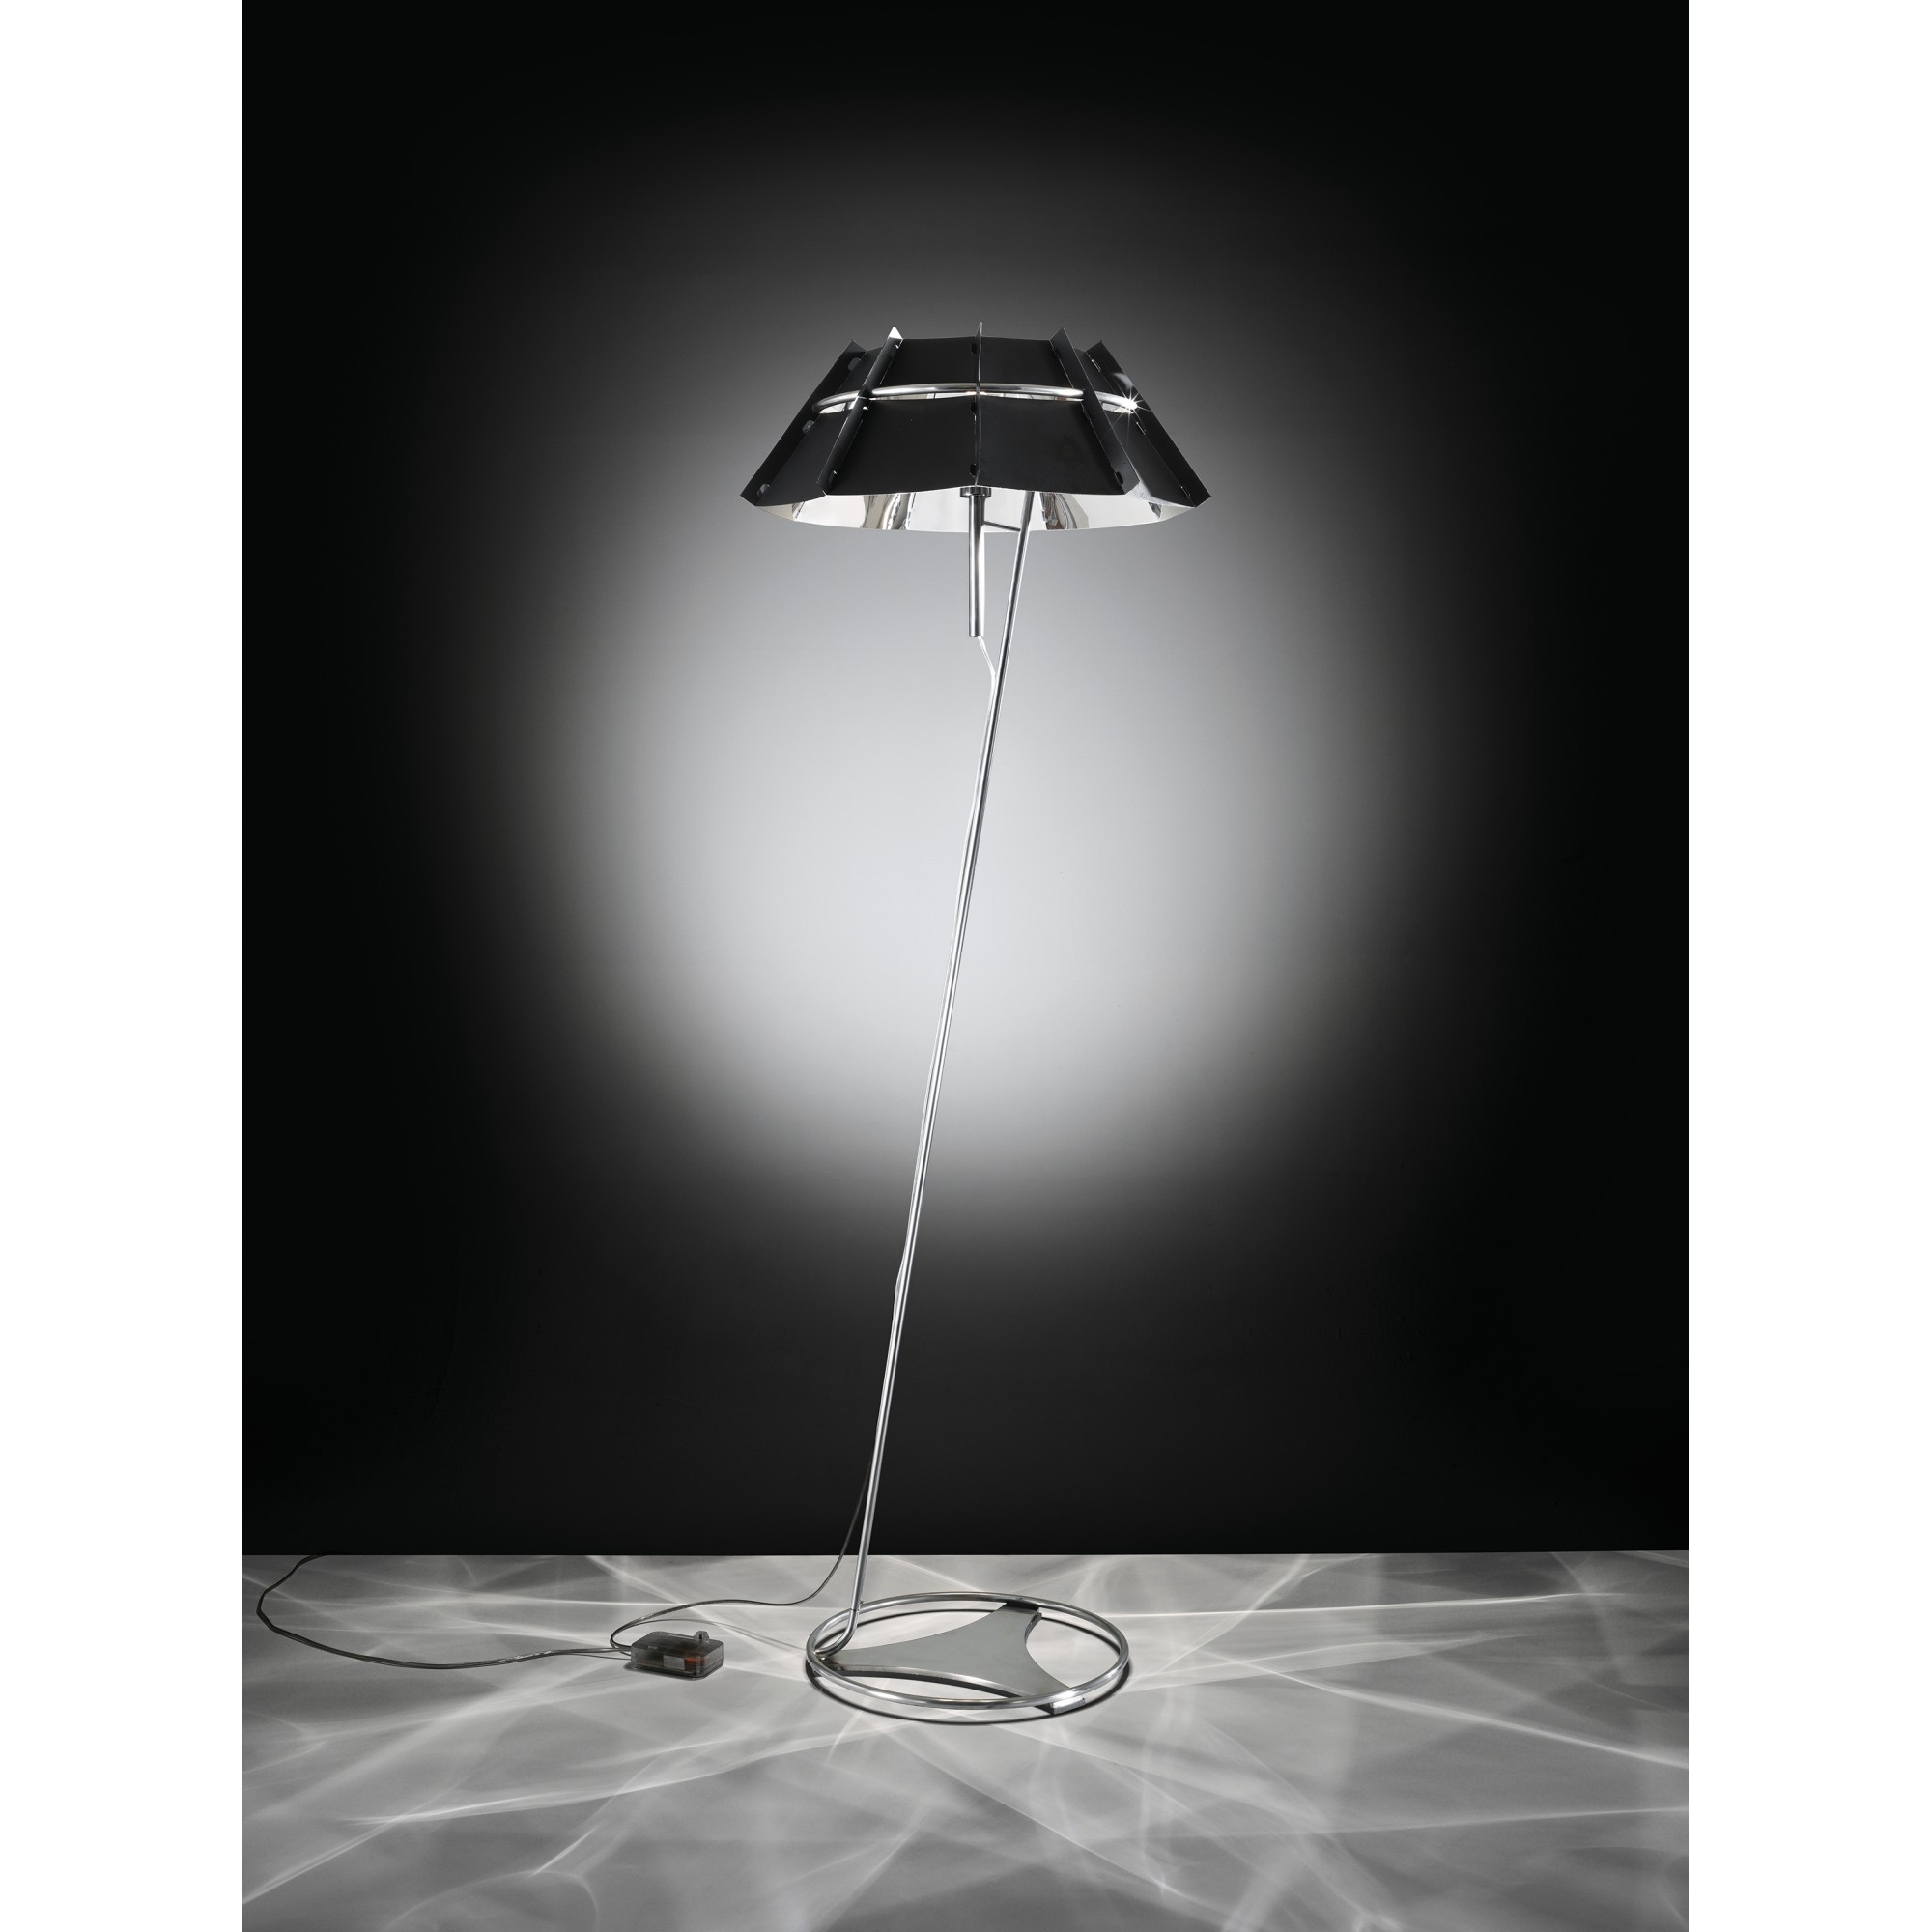 CHAPEAU 1L BLACK LAMBADER - Modern -  SLAMP